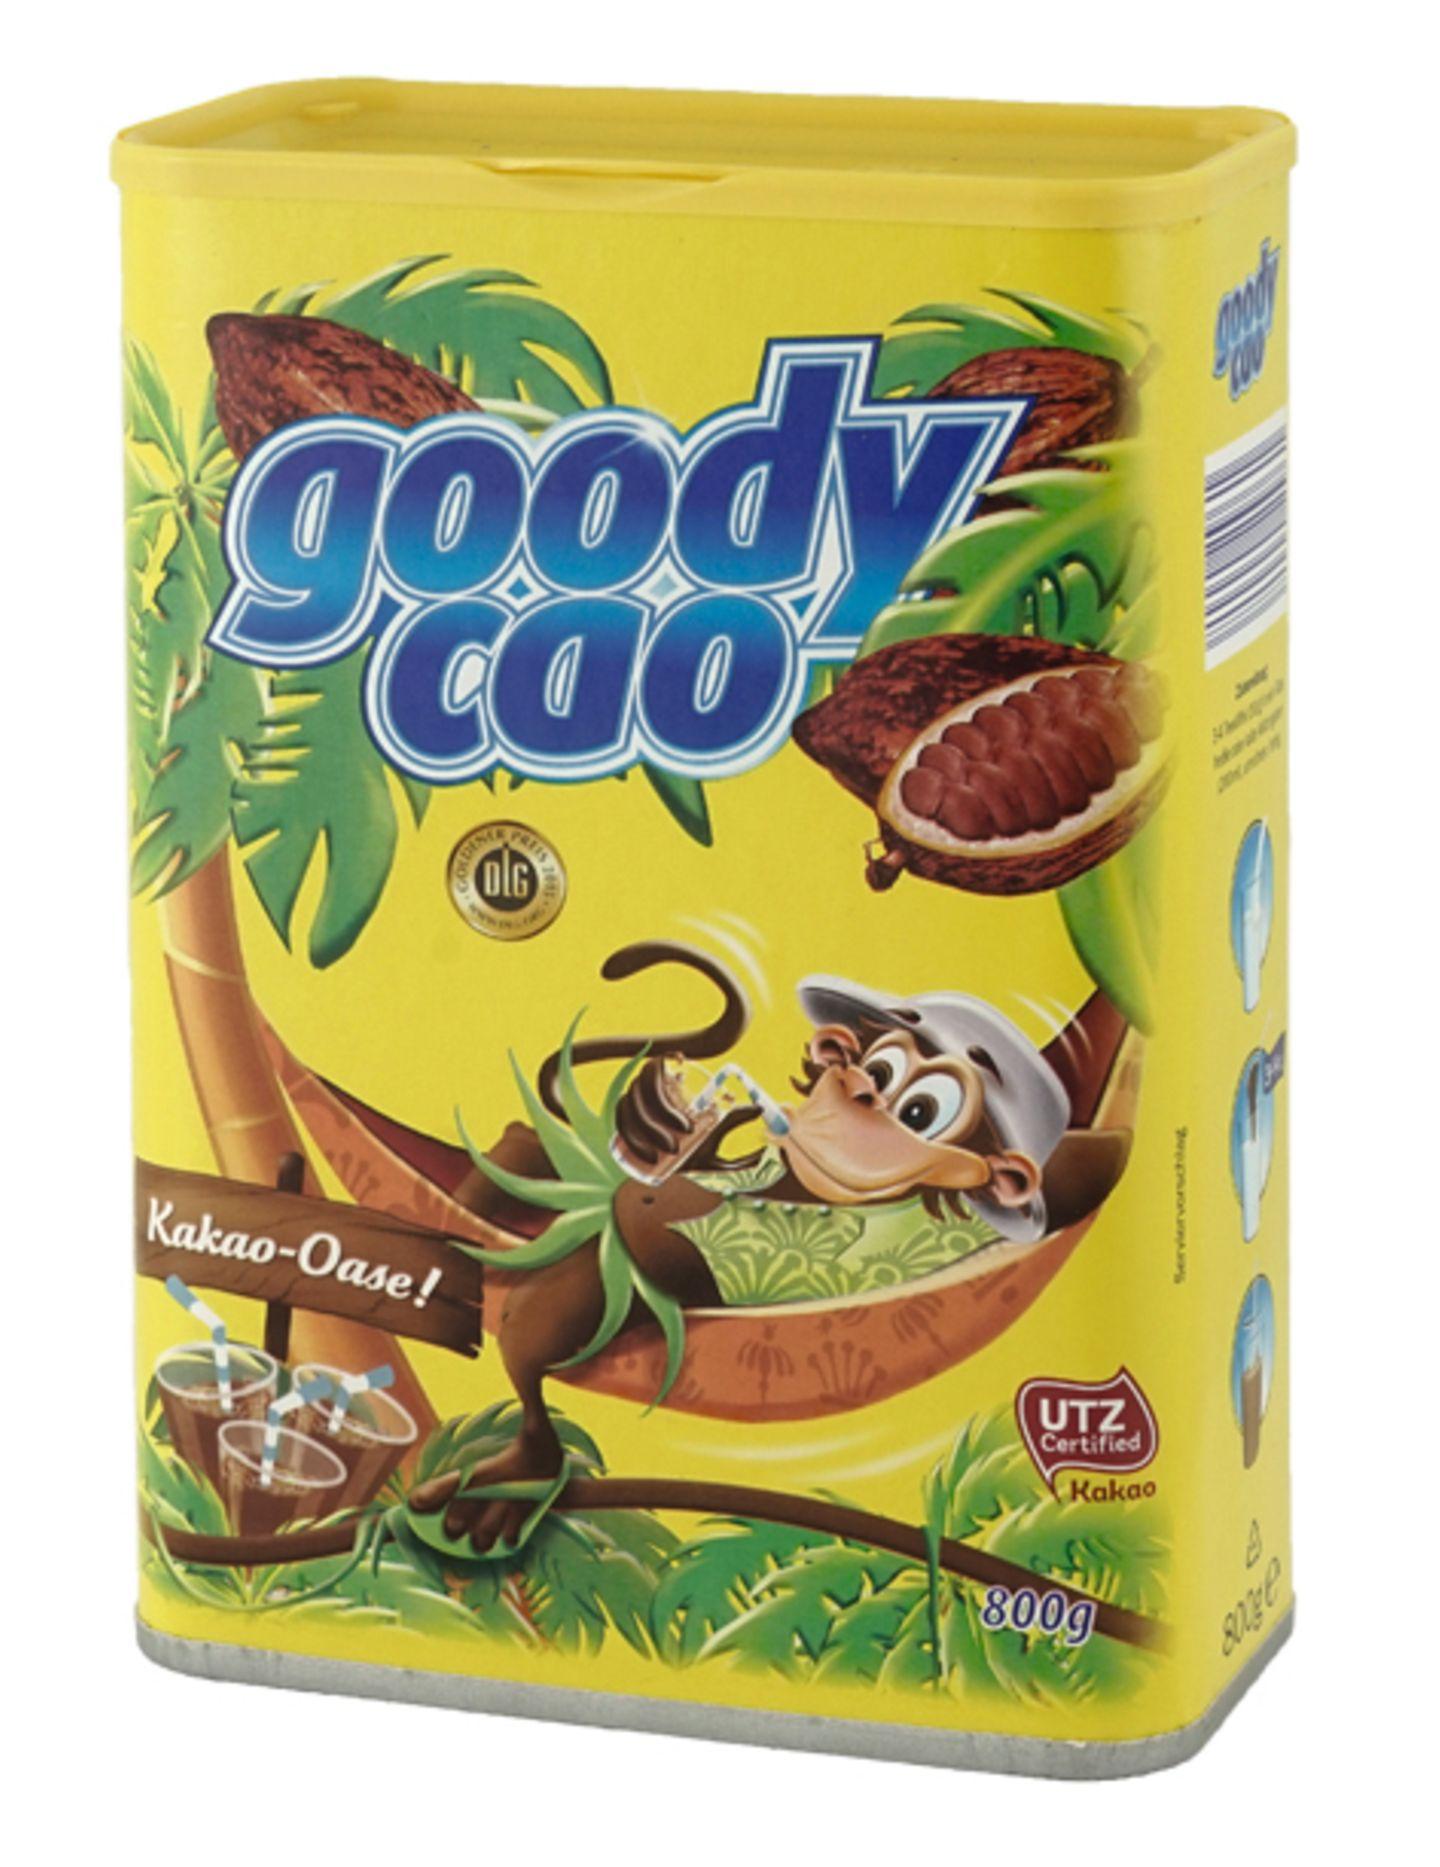 ökotest Kakaopulver